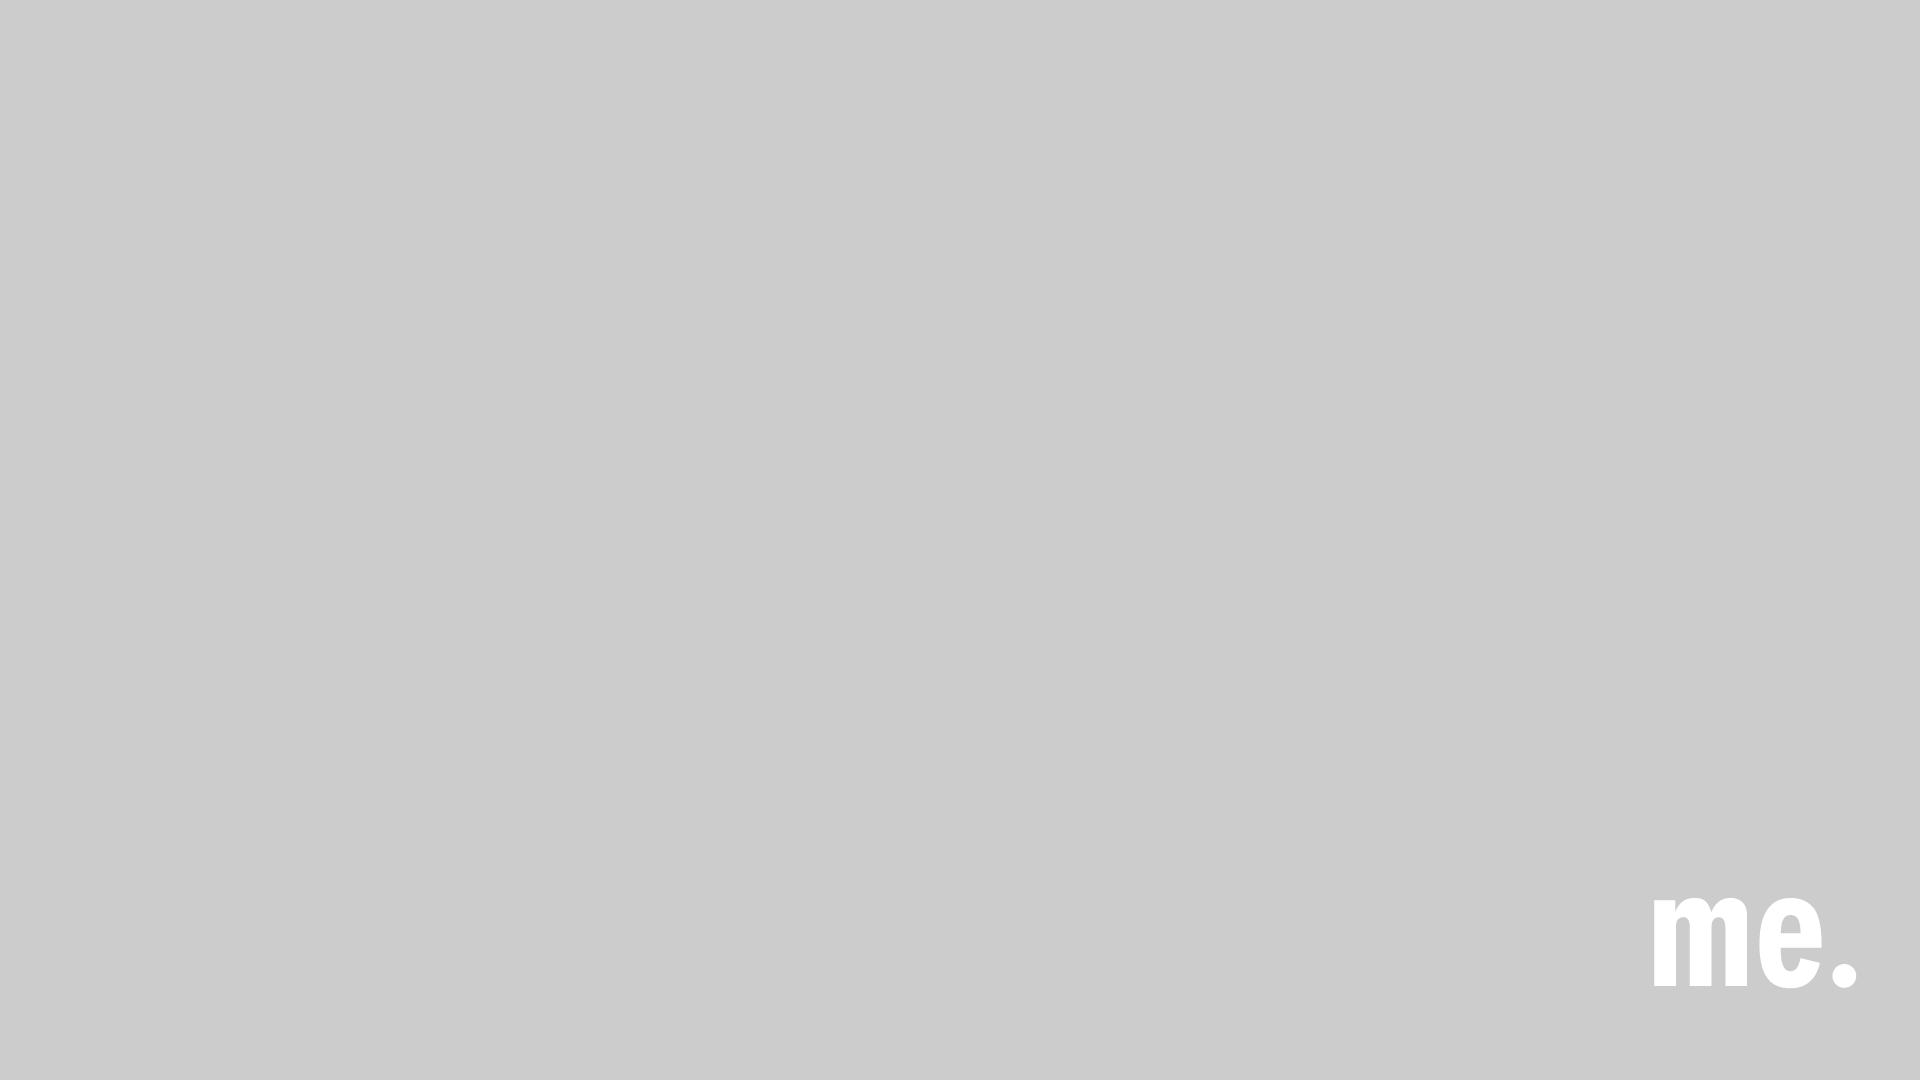 Platz 16: Ludacris: 65 Millionen Dollar